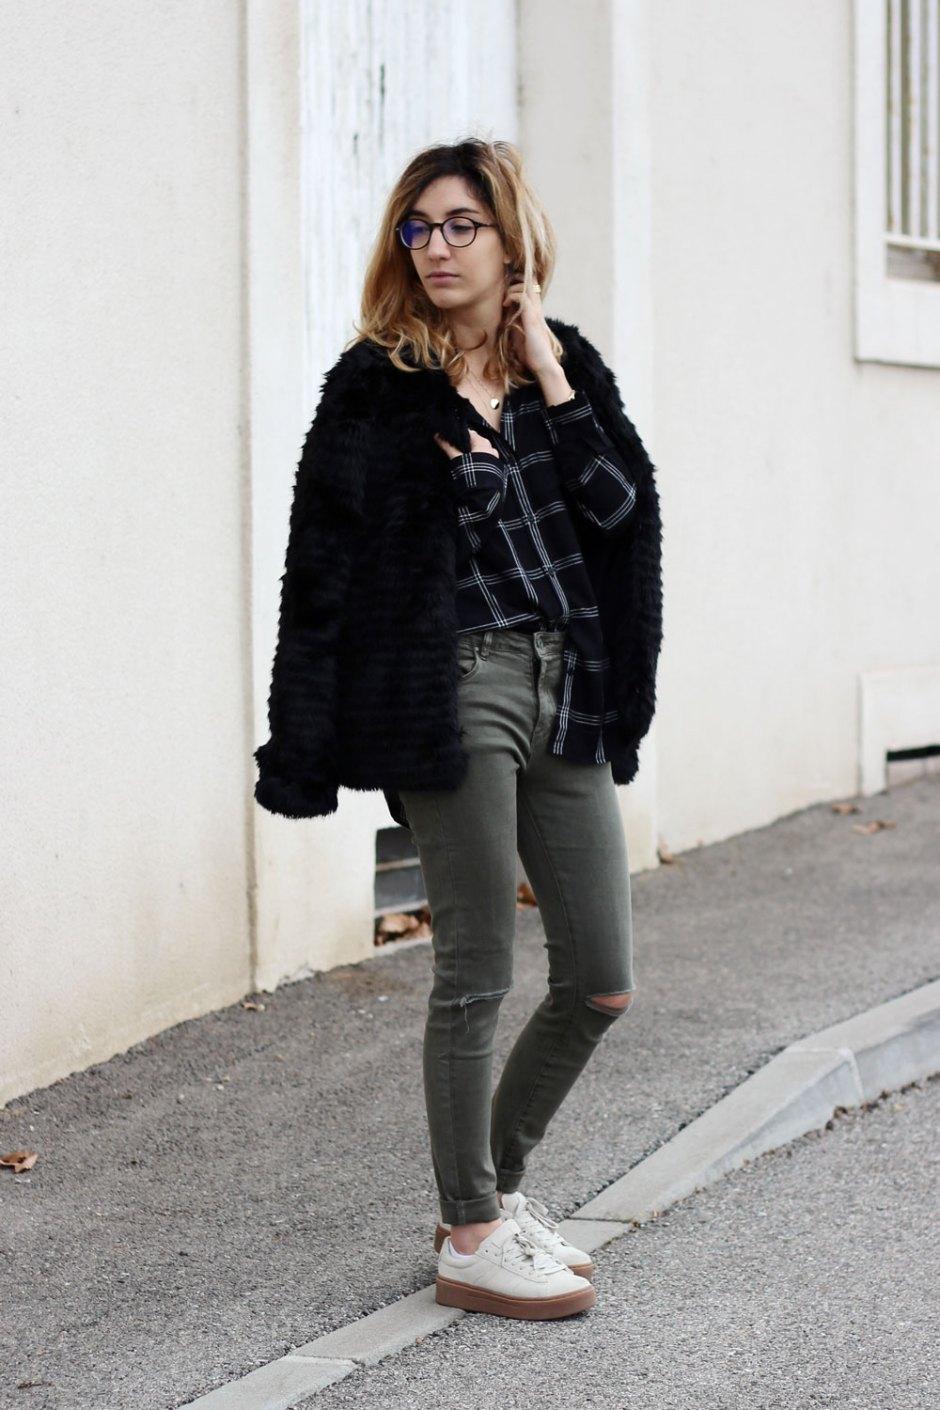 blog-mode-look-manteau-fausse-fourrure-jeans-kaki